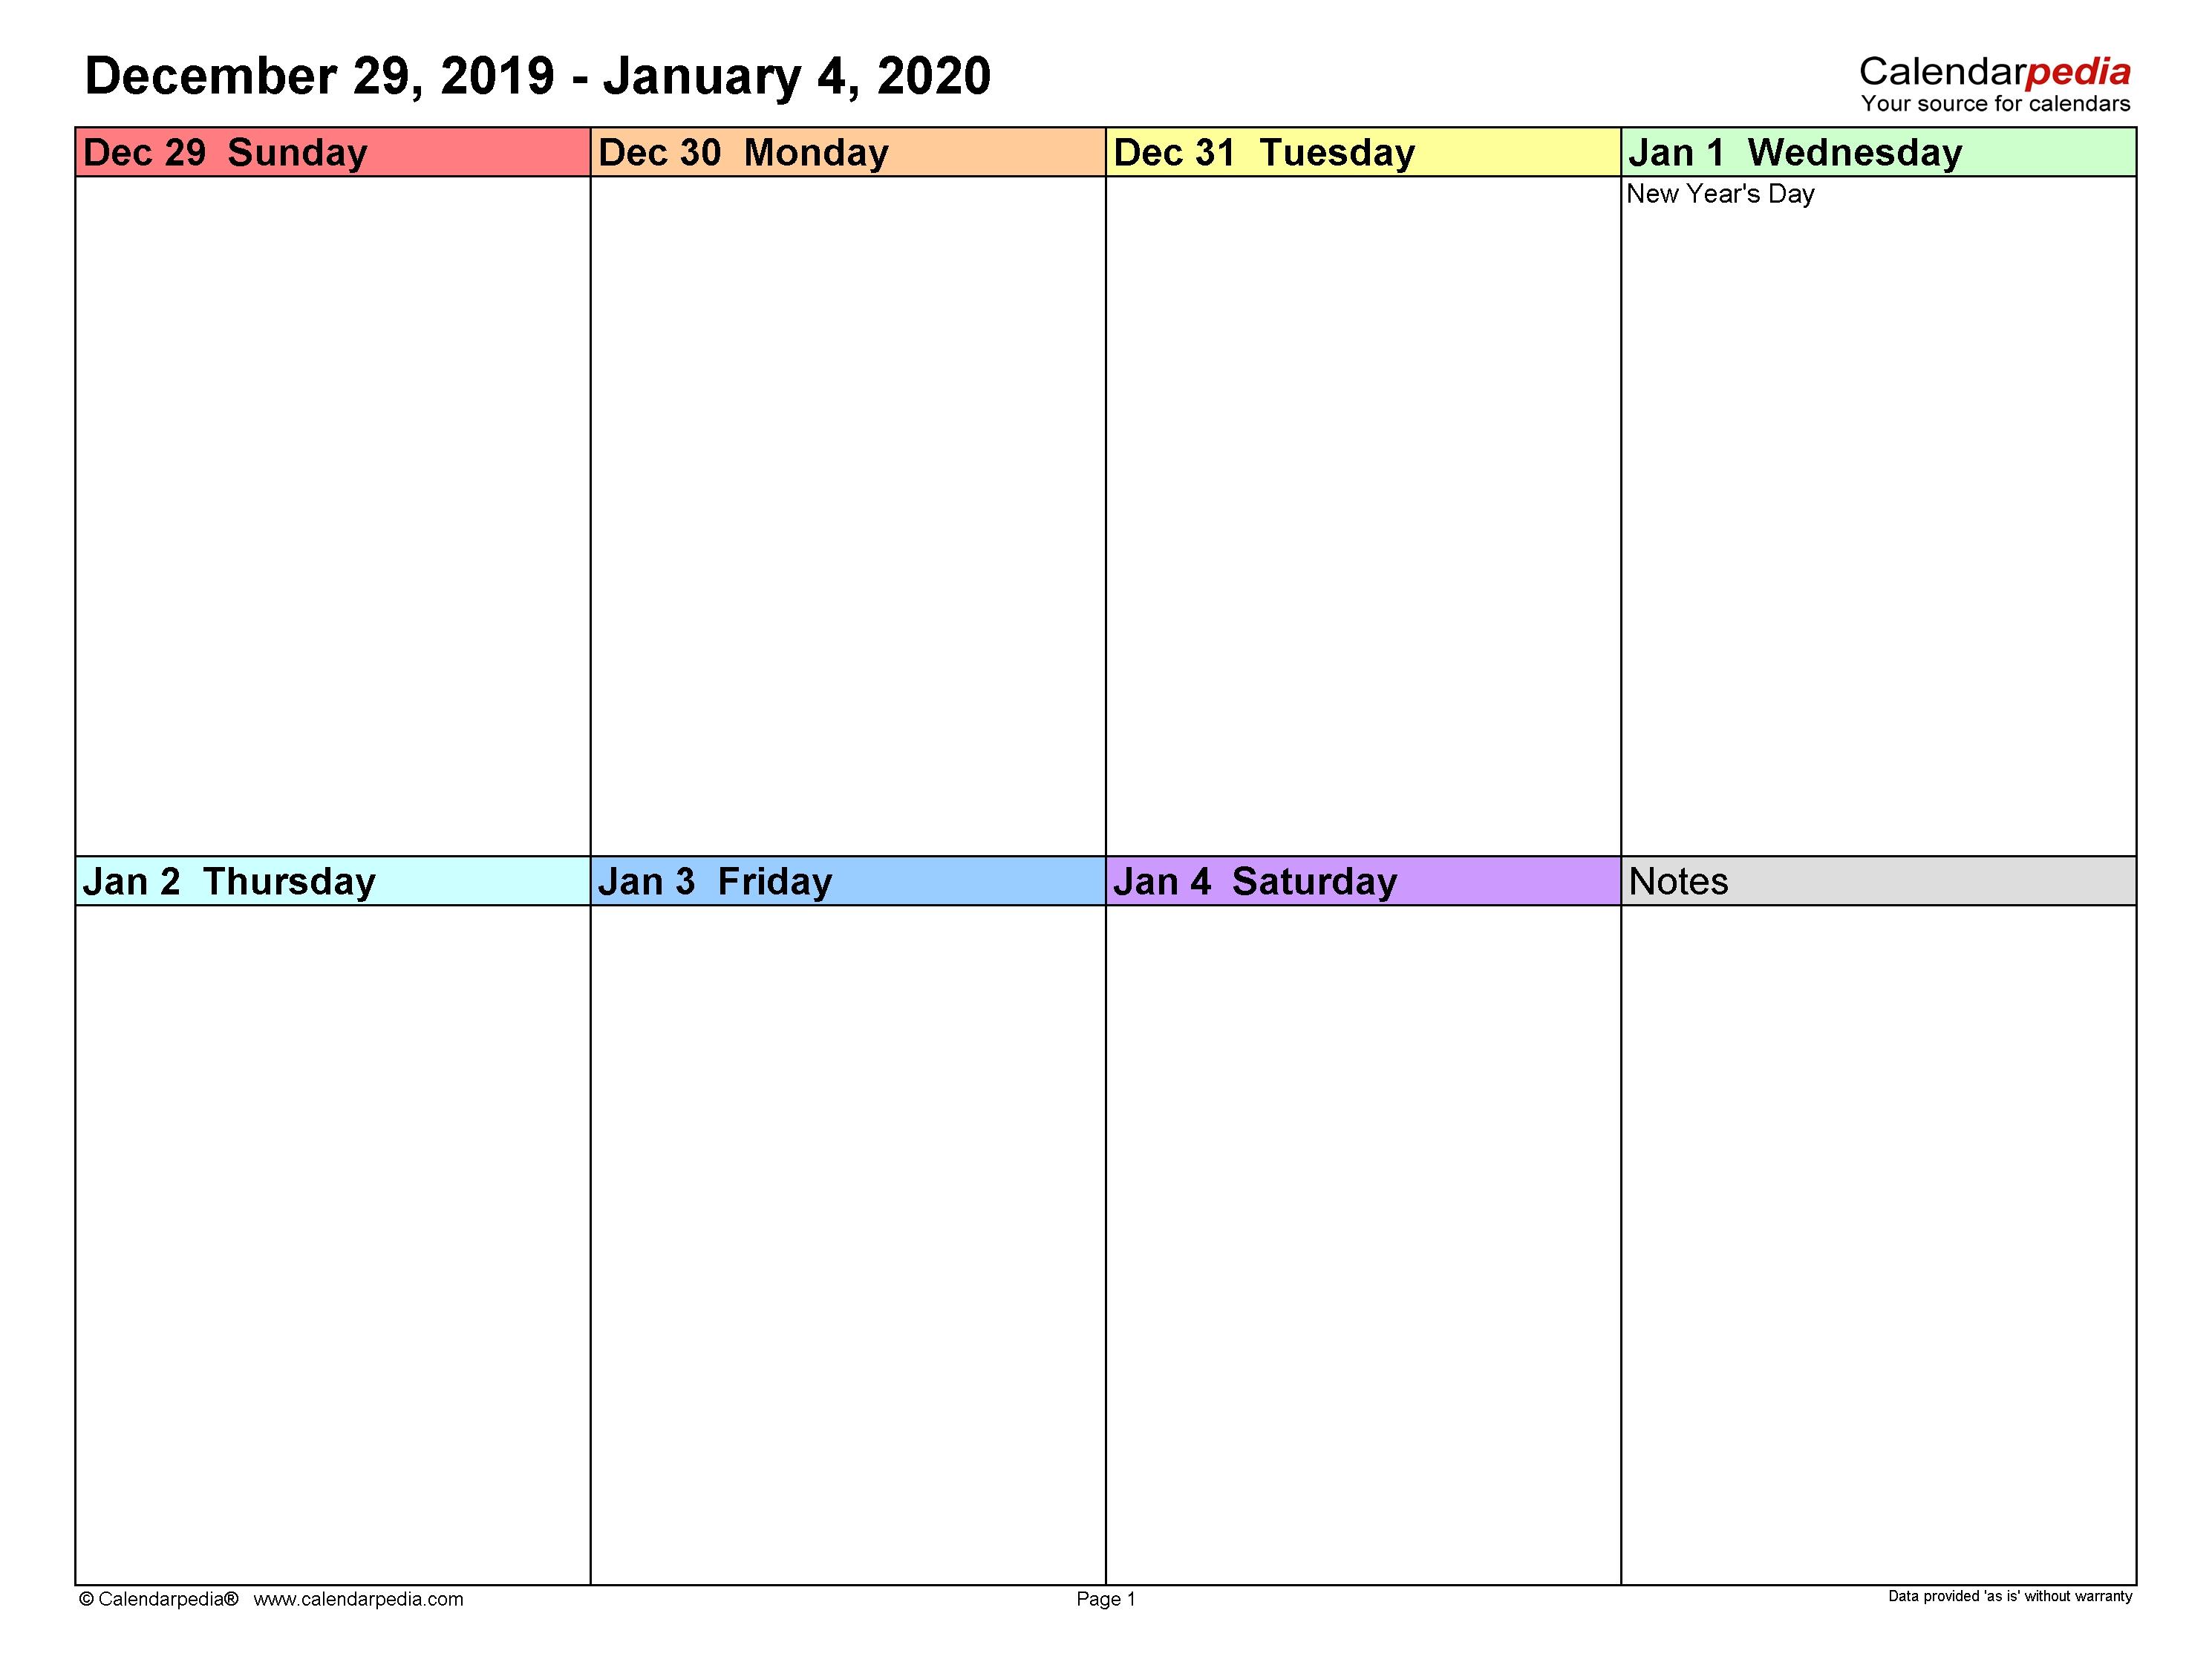 Weekly Calendars 2020 For Word - 12 Free Printable Templates pertaining to 1 Week Blank Calendar Free Printable